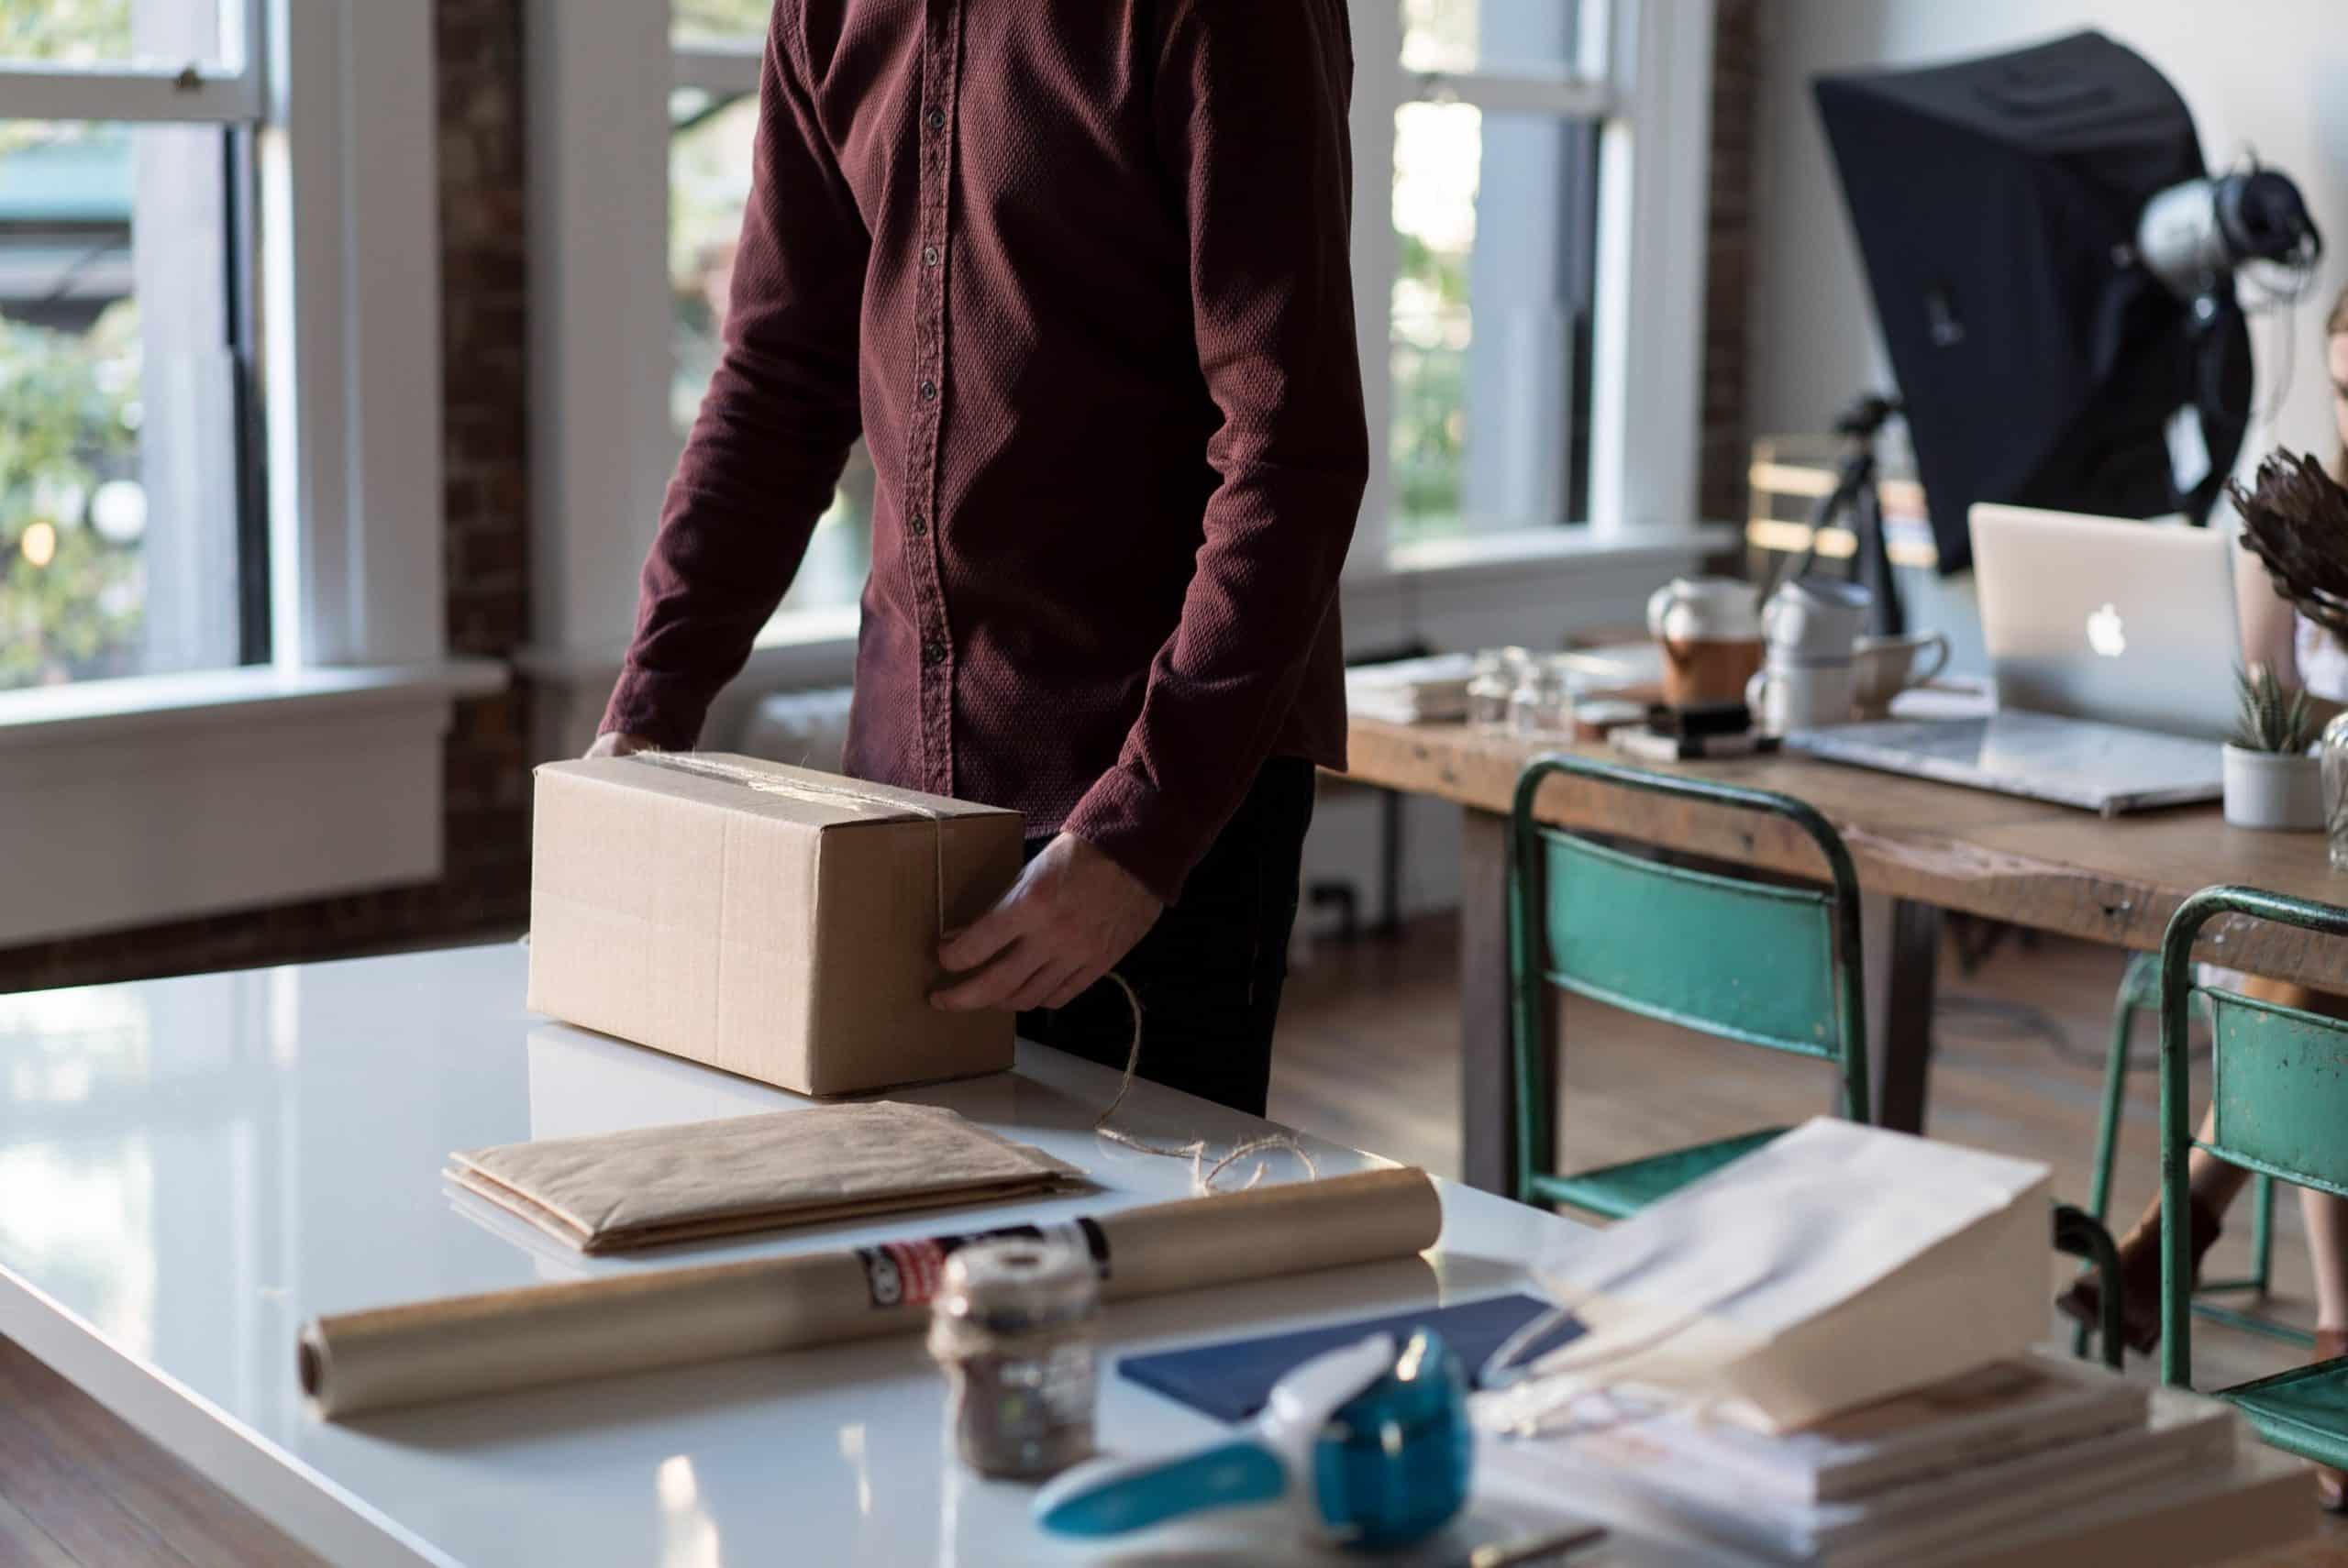 How to make an employee redundant